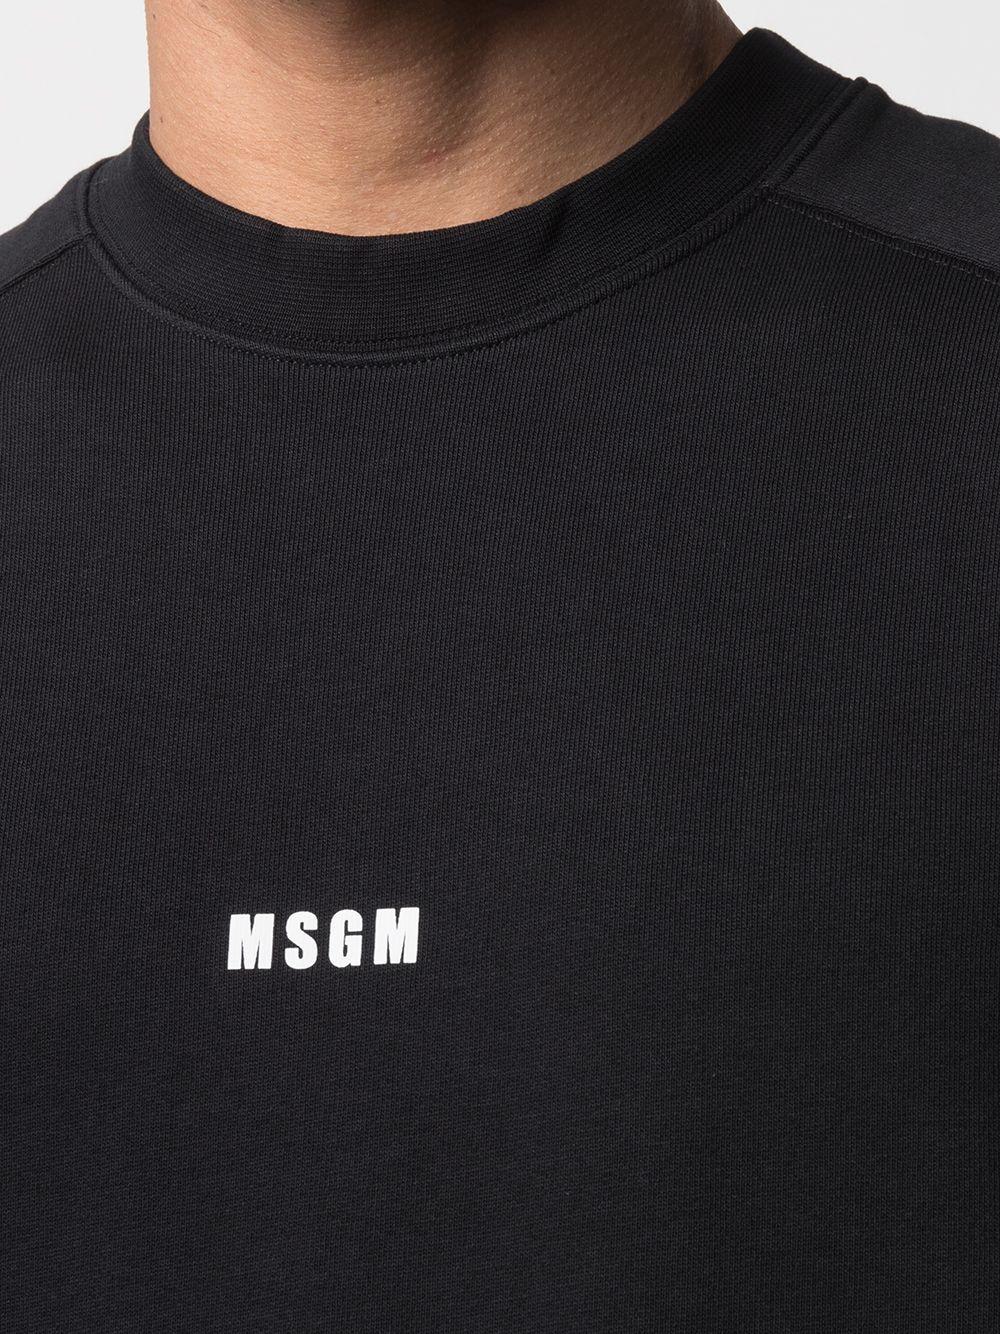 Msgm felpa a girocollo con logo uomo MSGM | Felpe | 3040MM69 21709999